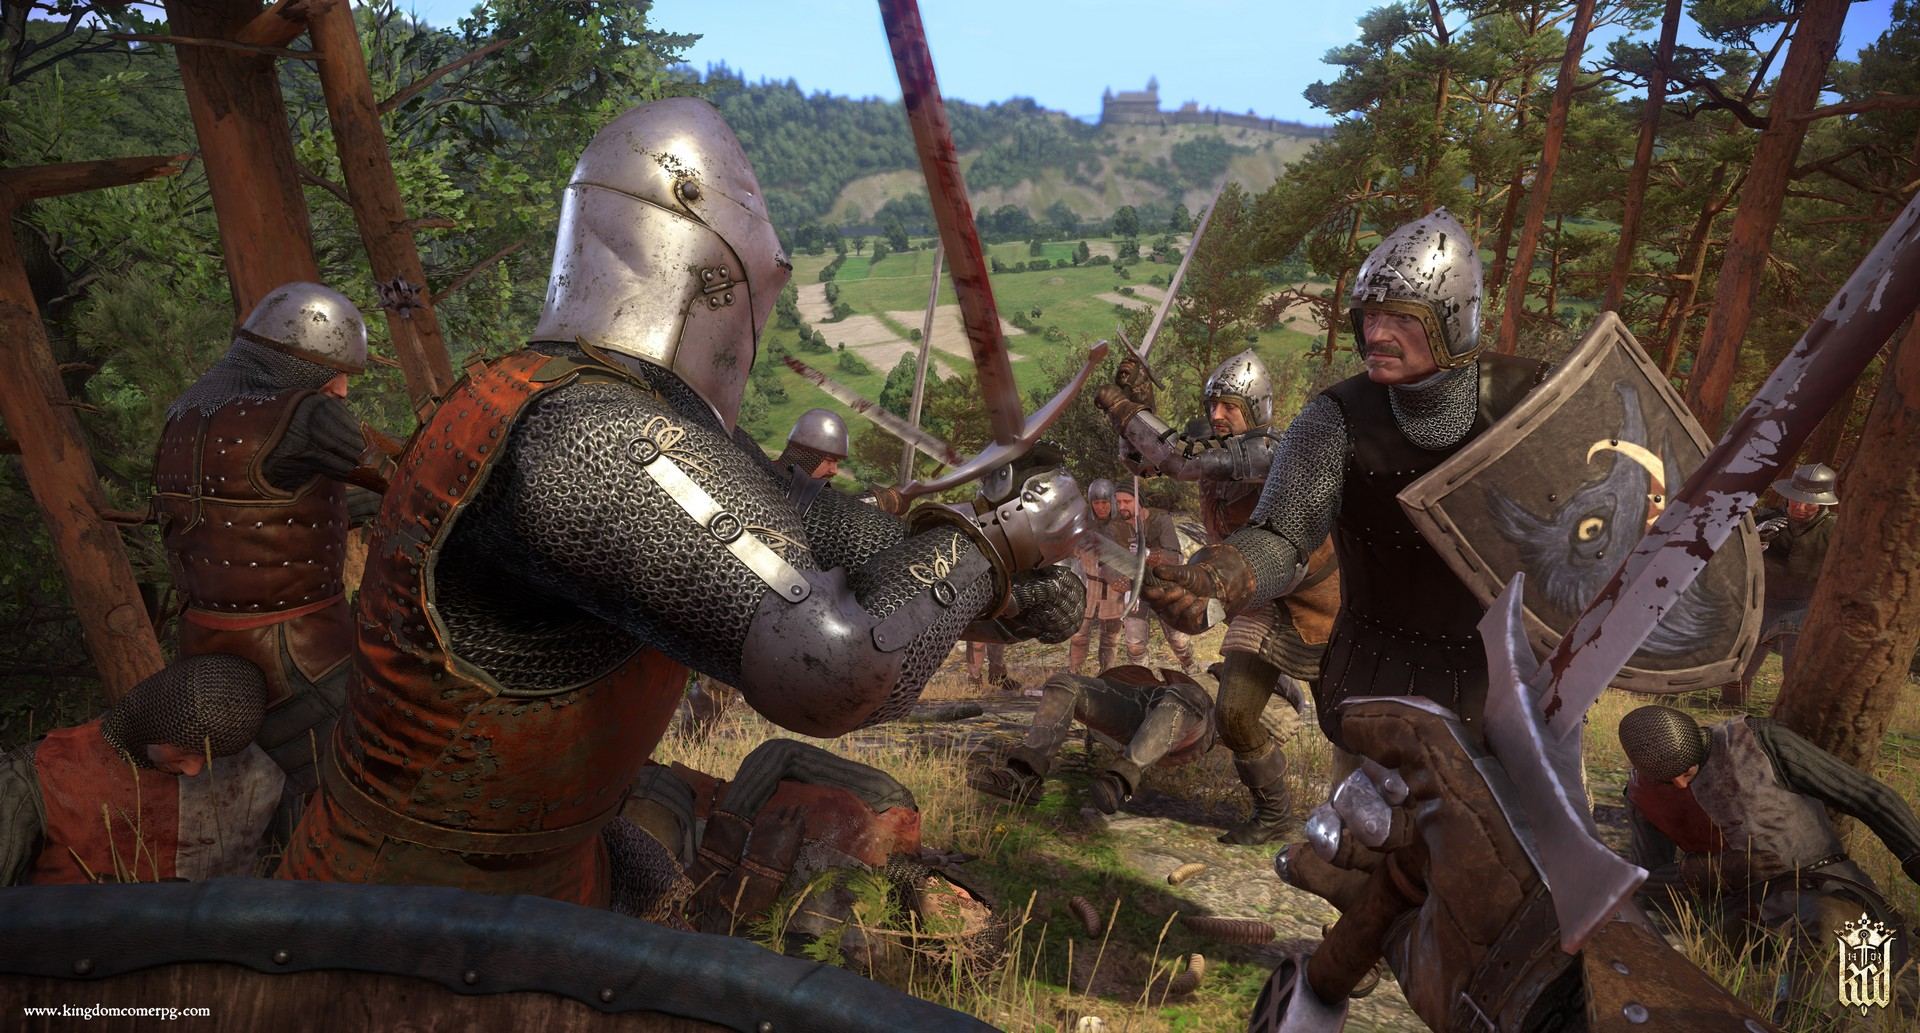 lhKlcsNSiFsZW - 【速報】 魔法もドラゴンも登場しない、リアルな中世オープンワールドゲームが爆誕!面白そうだぞ!